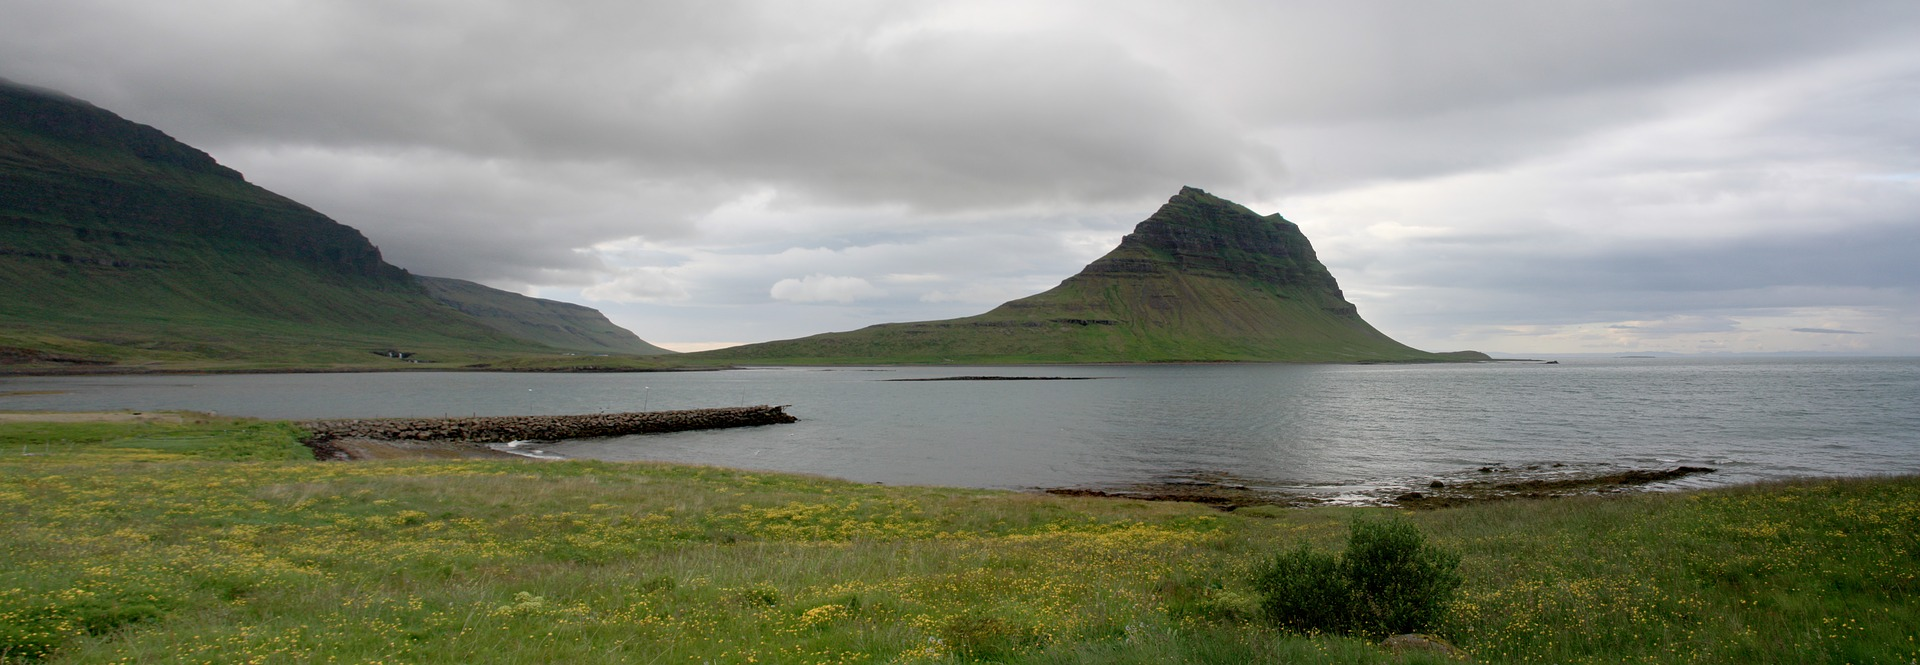 Kirkjufell, Iceland, mountain